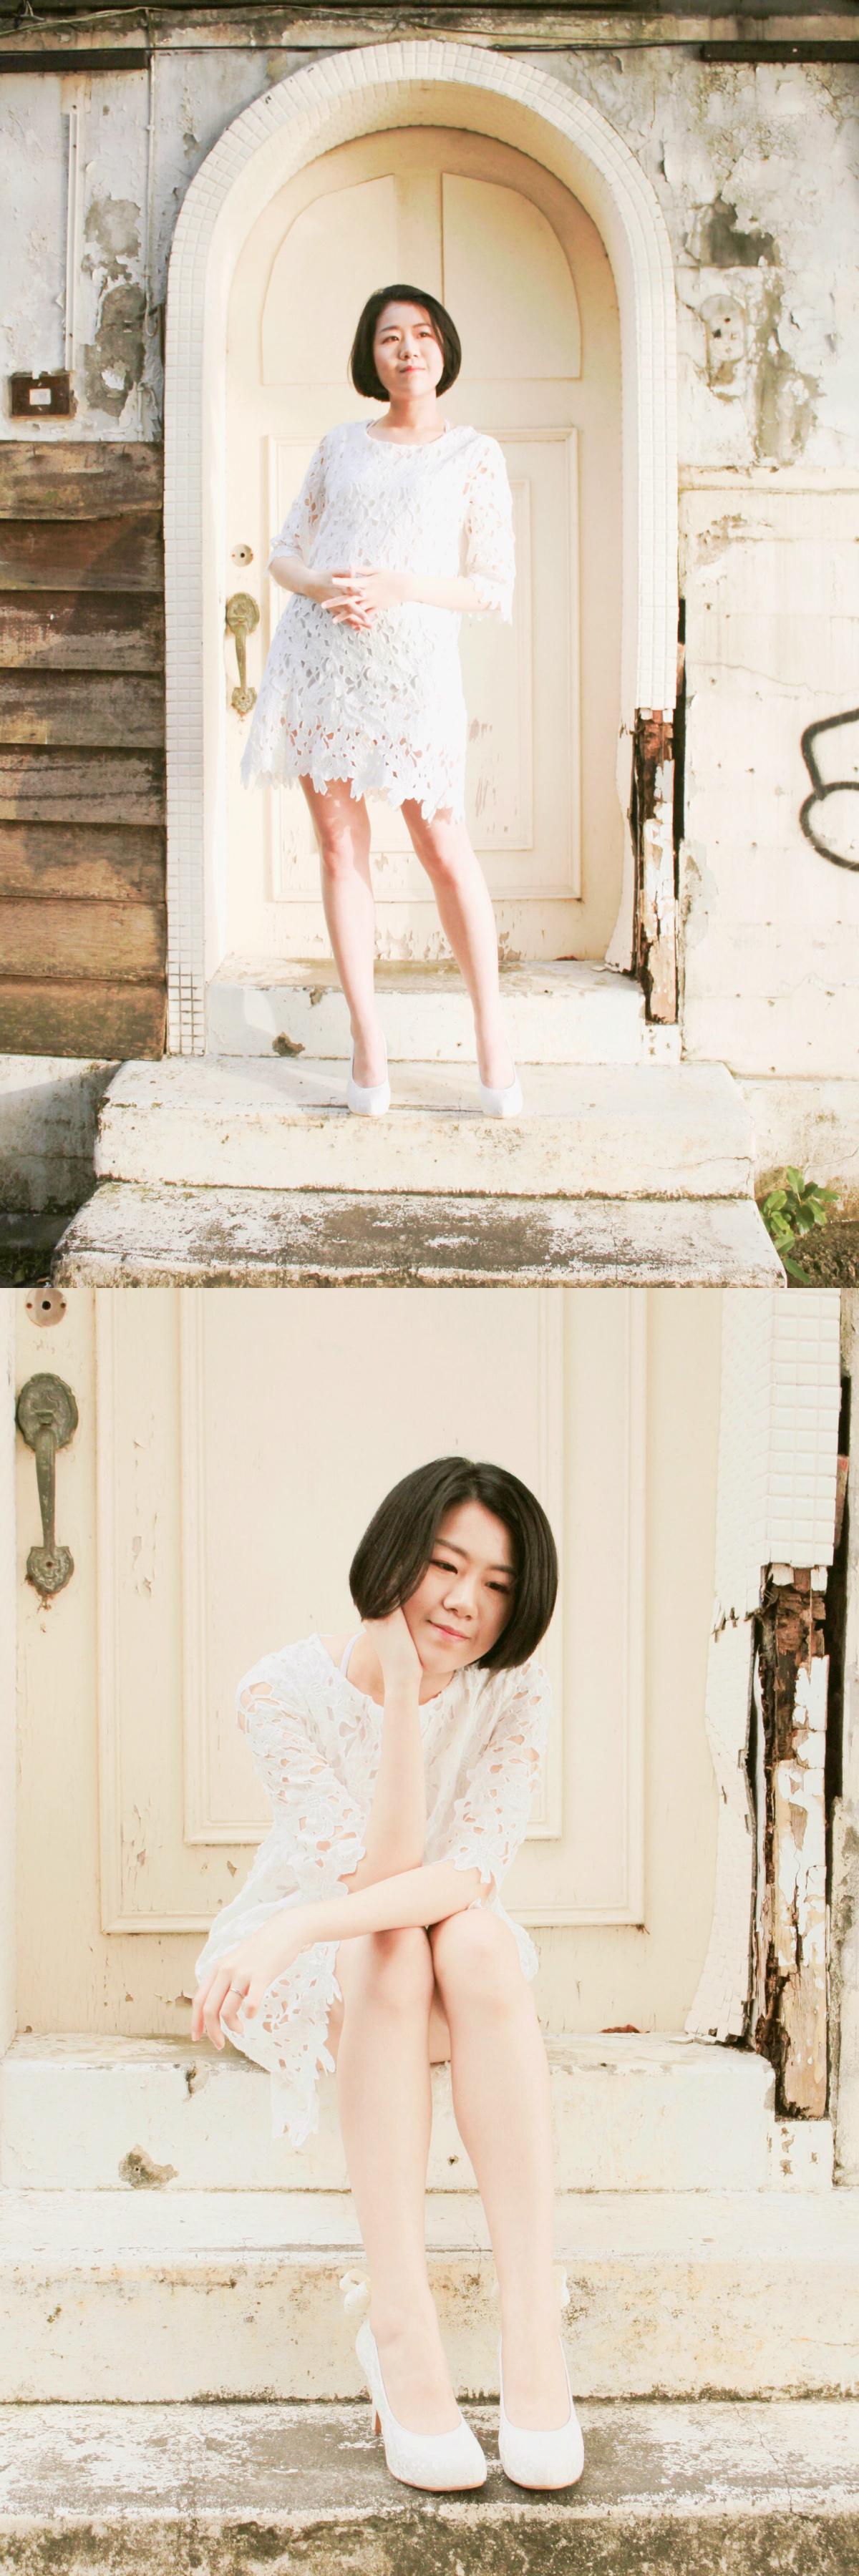 Epris艾佩絲婚宴女鞋 (12).jpg